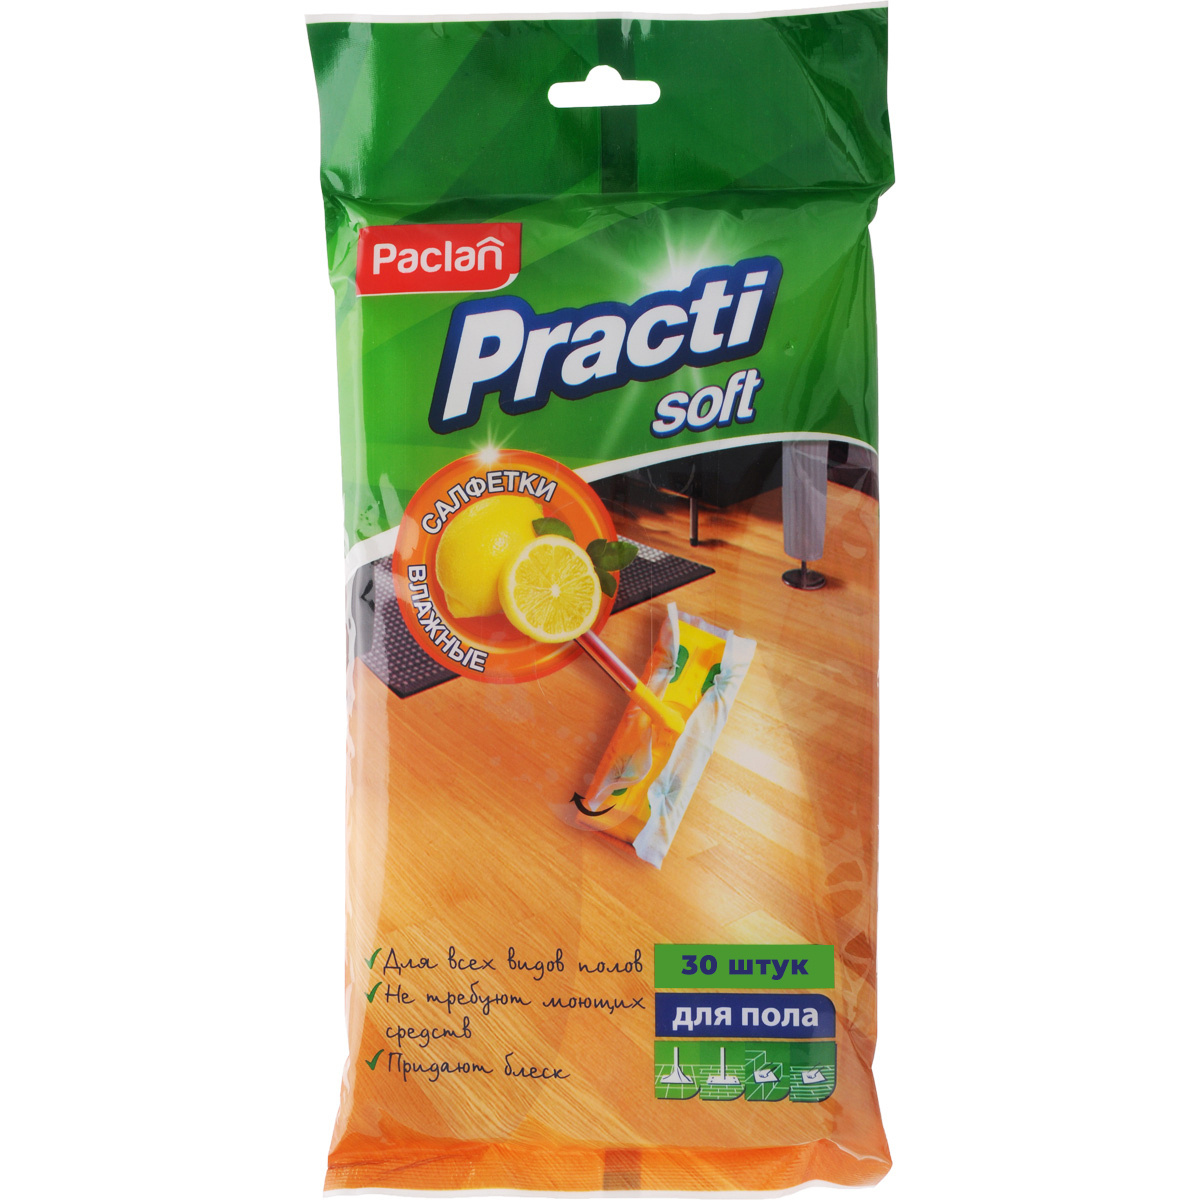 Салфетки для уборки Paclan, 30 шт, 1 уп. #1